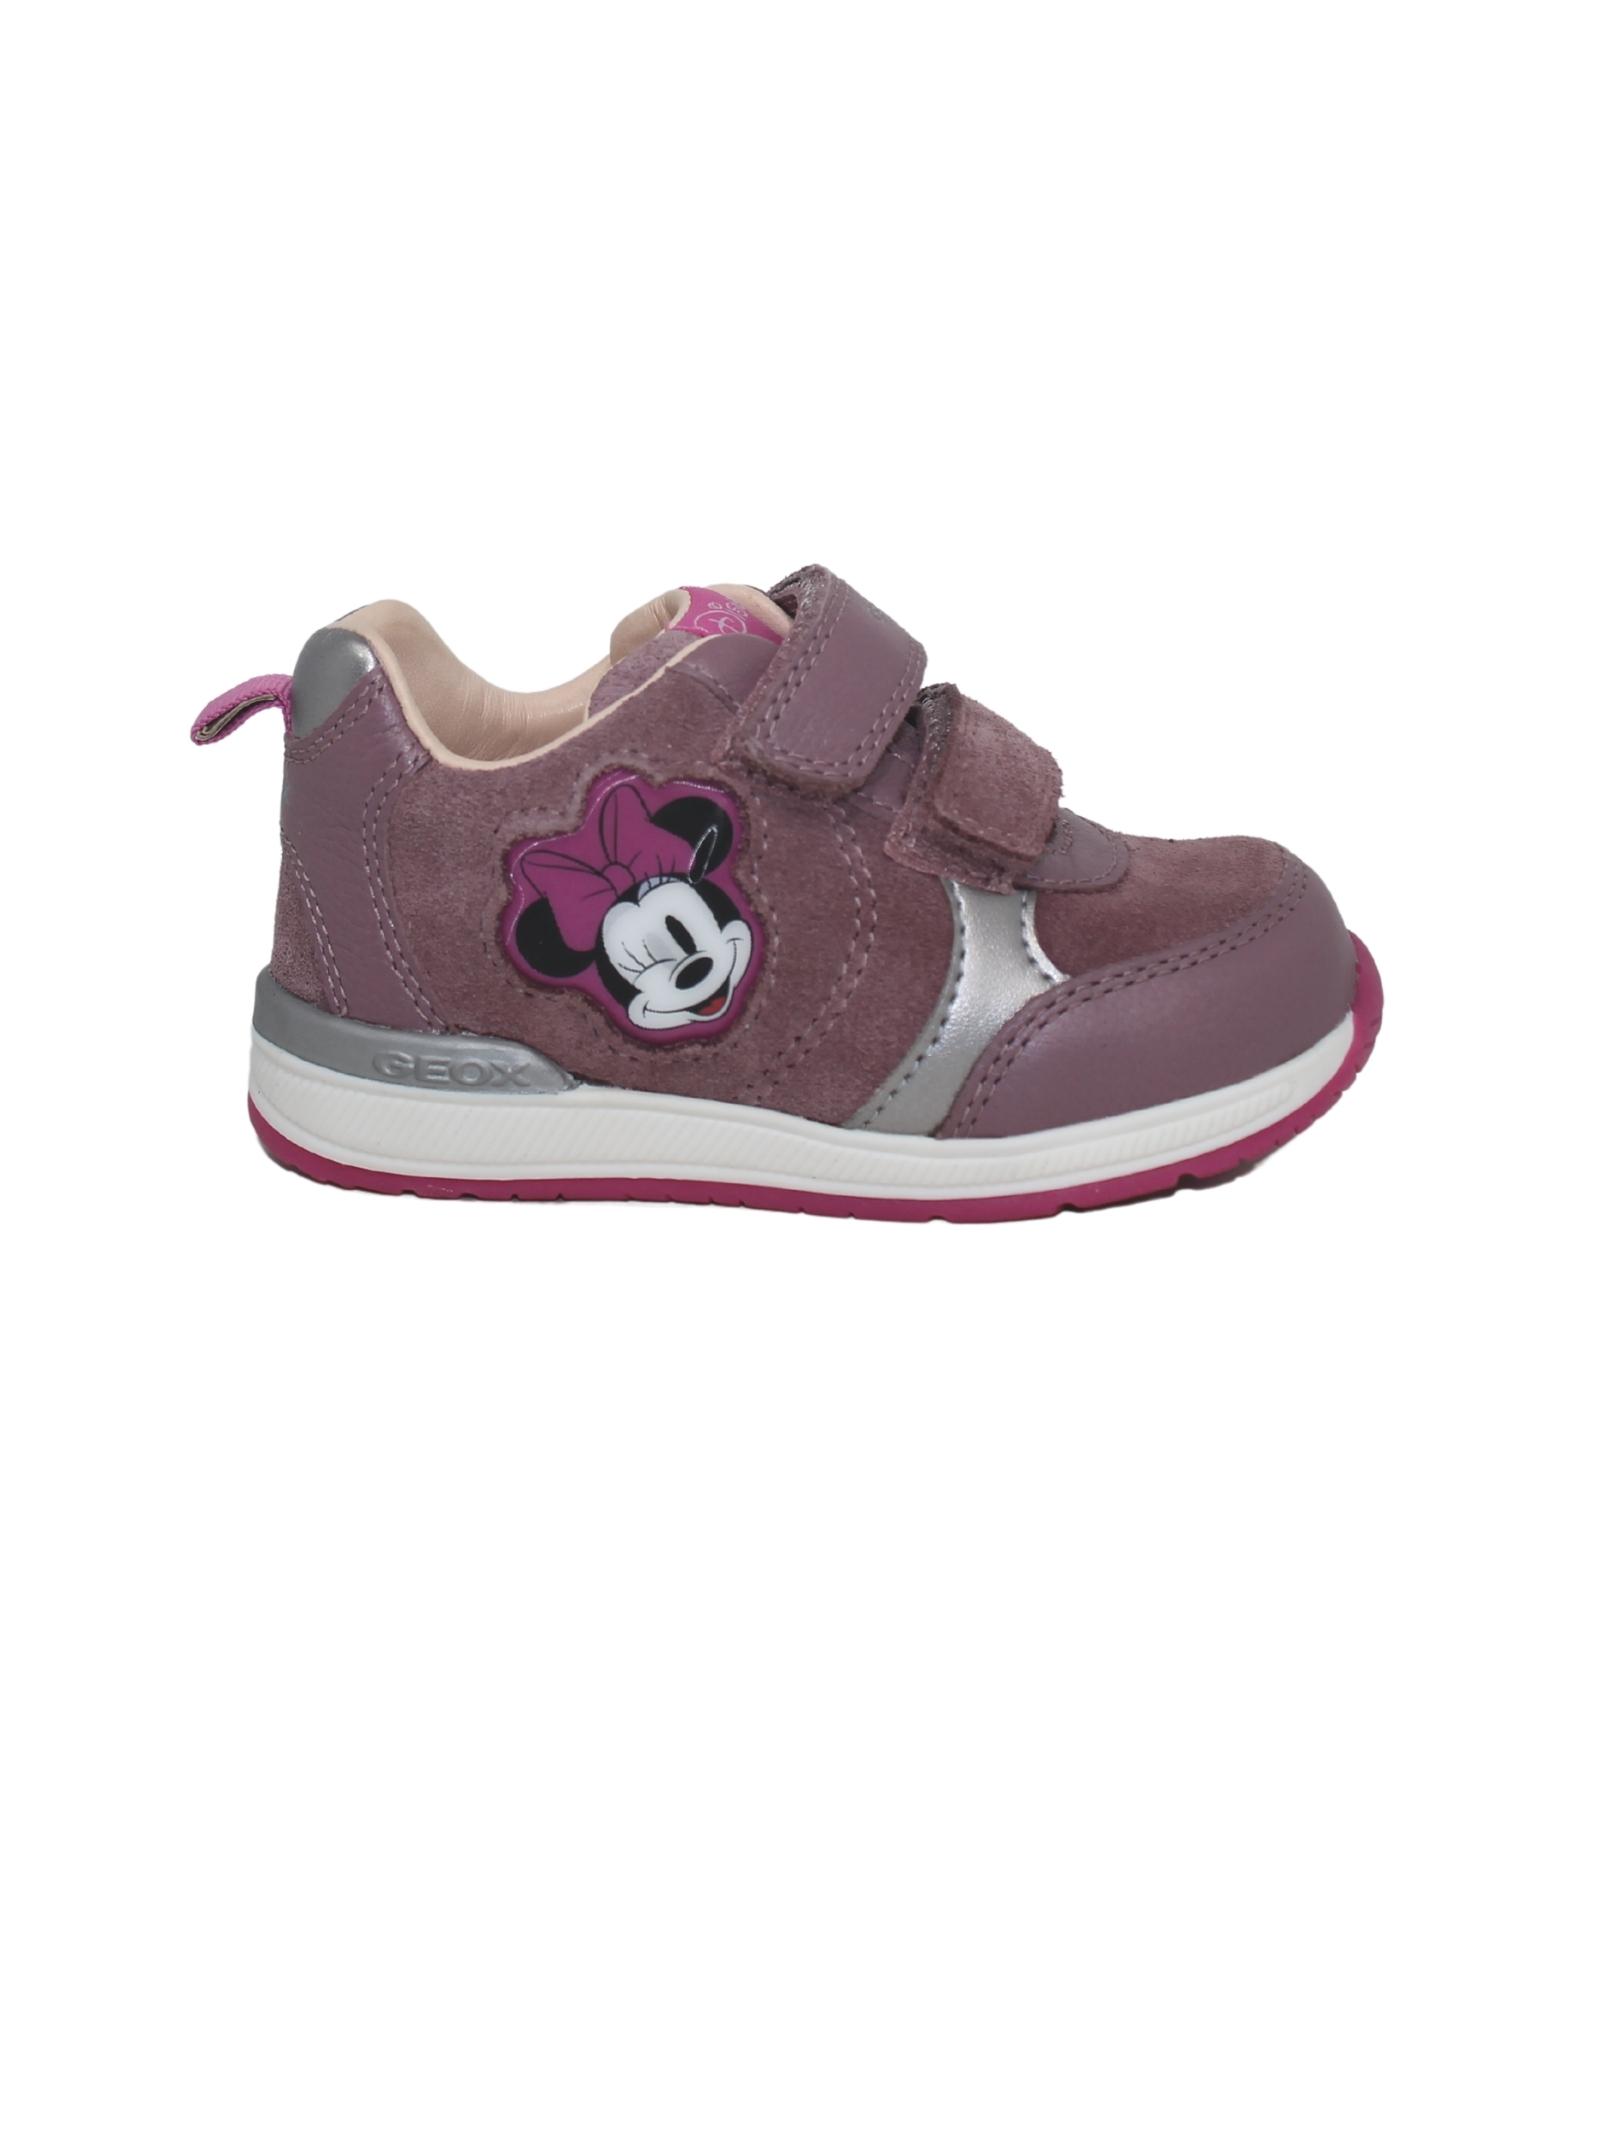 Sneakers Minnie Bambina GEOX KIDS | Sneakers | B160LB02244C8025